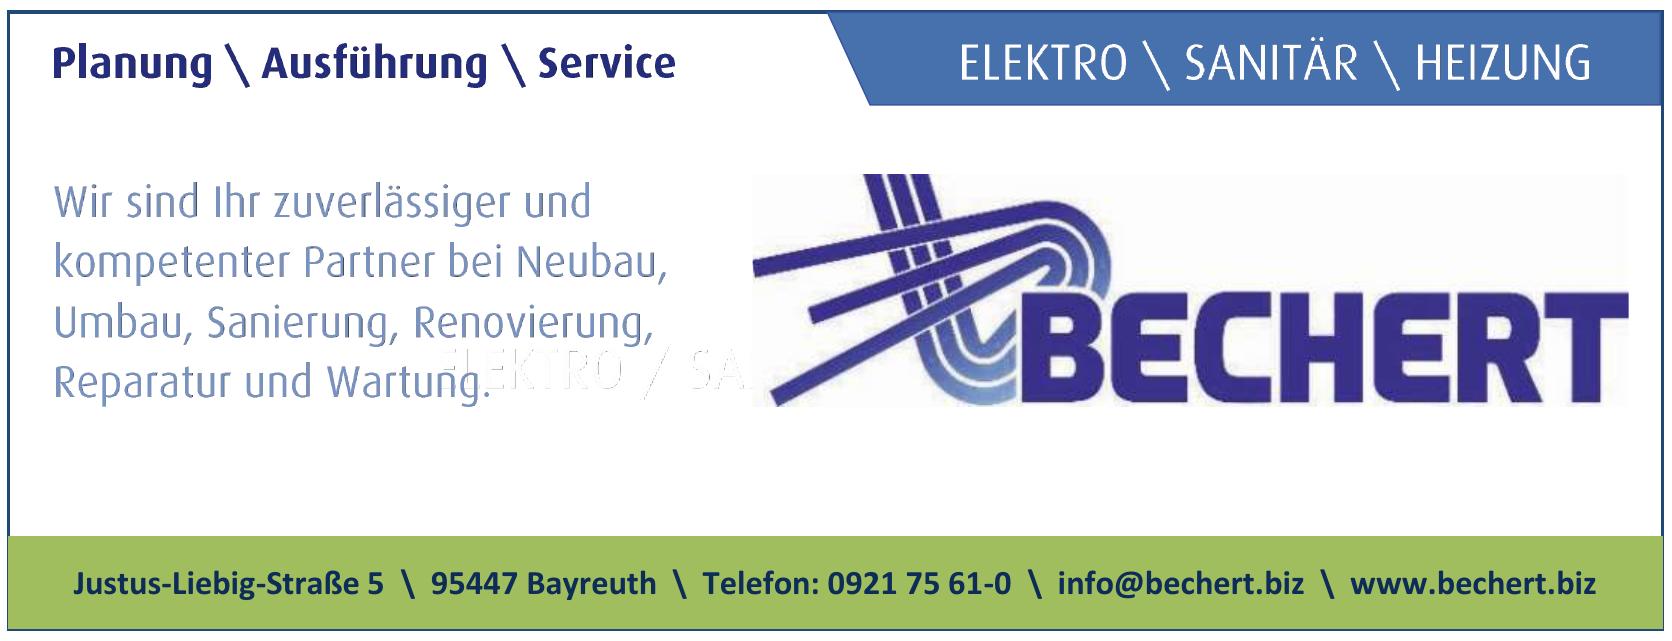 Bechert - Elektro, Sanitär, Heizung